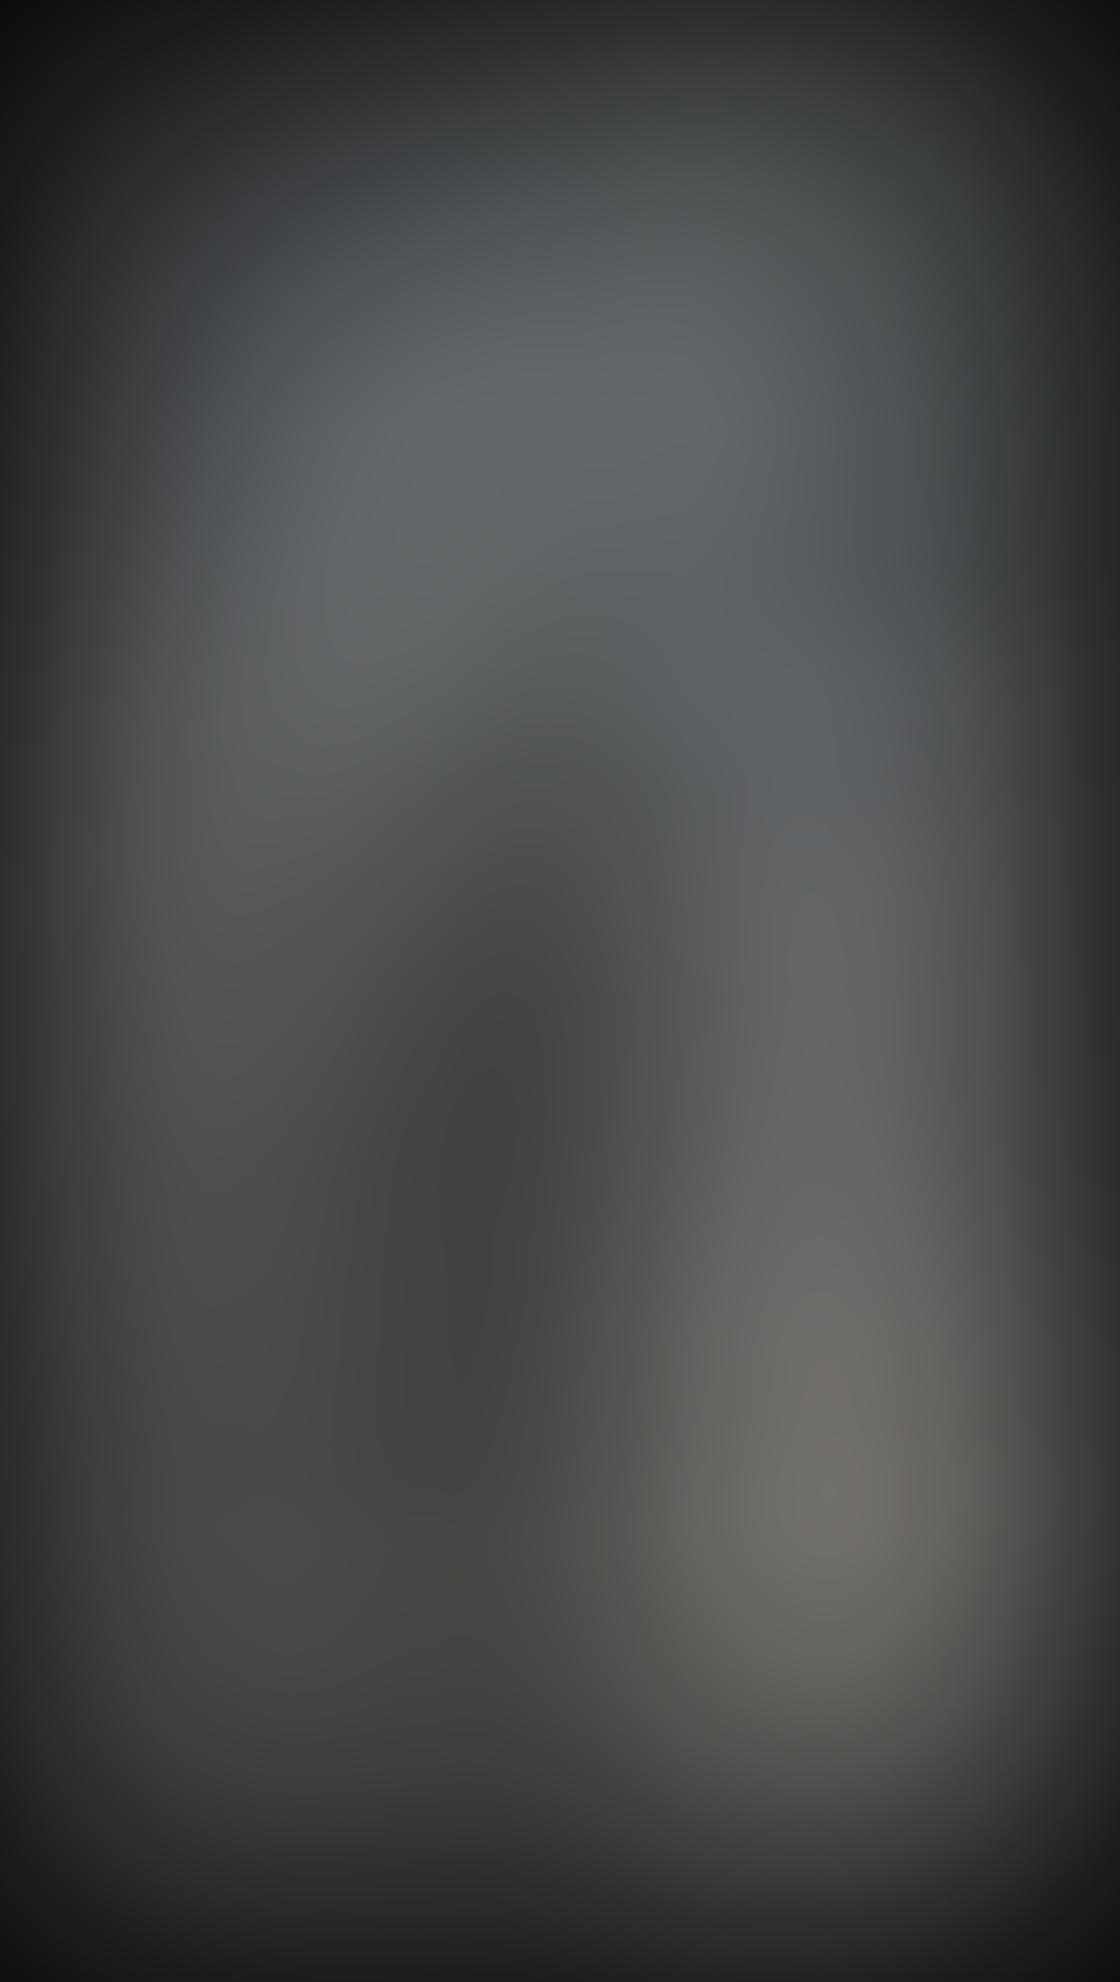 iPhone Photos Low Angle 11